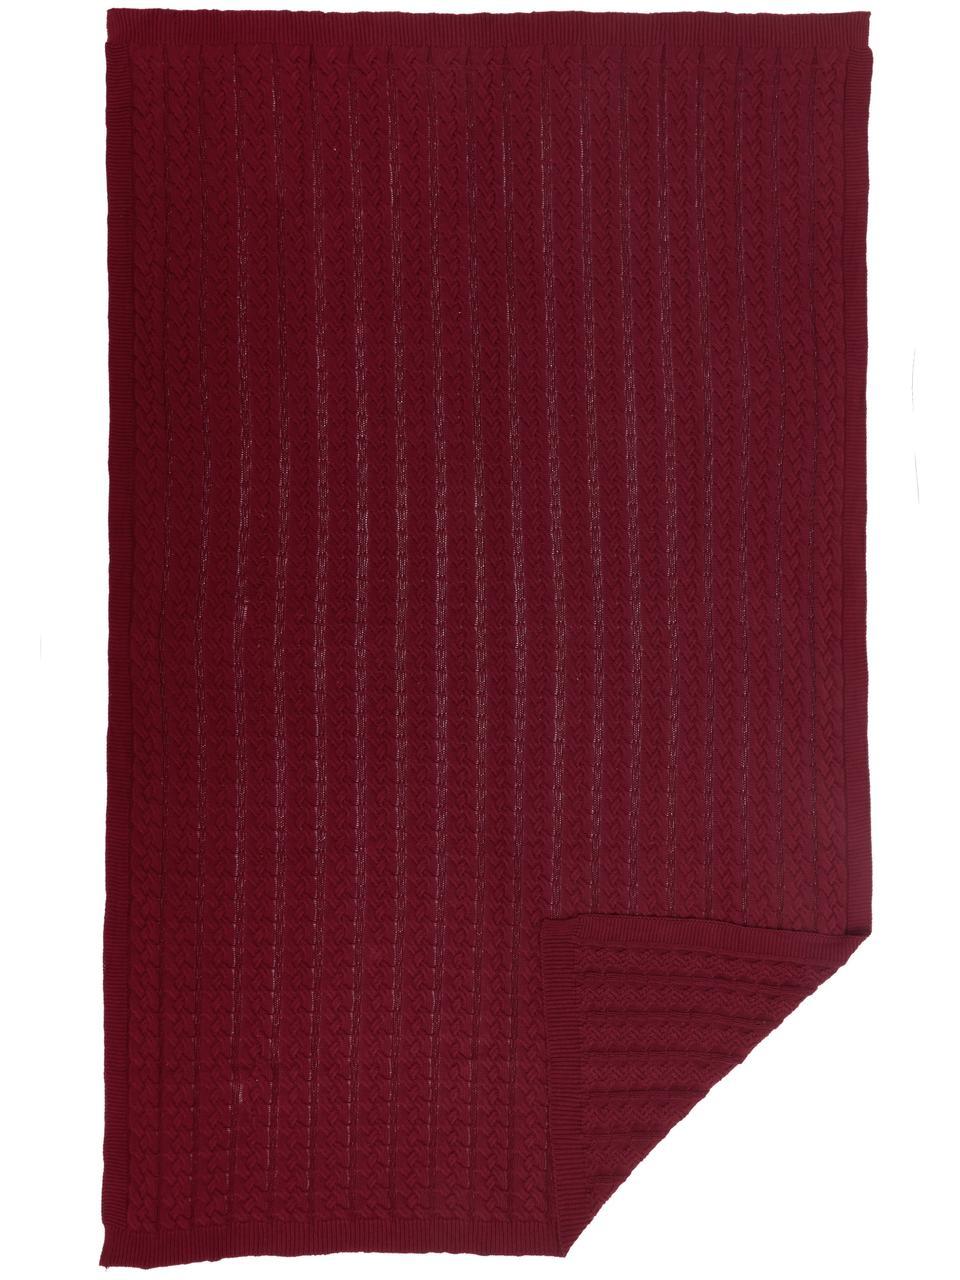 Strick-Plaid Caleb mit Zopfmuster, 100% Baumwolle, Dunkelrot, 130 x 170 cm